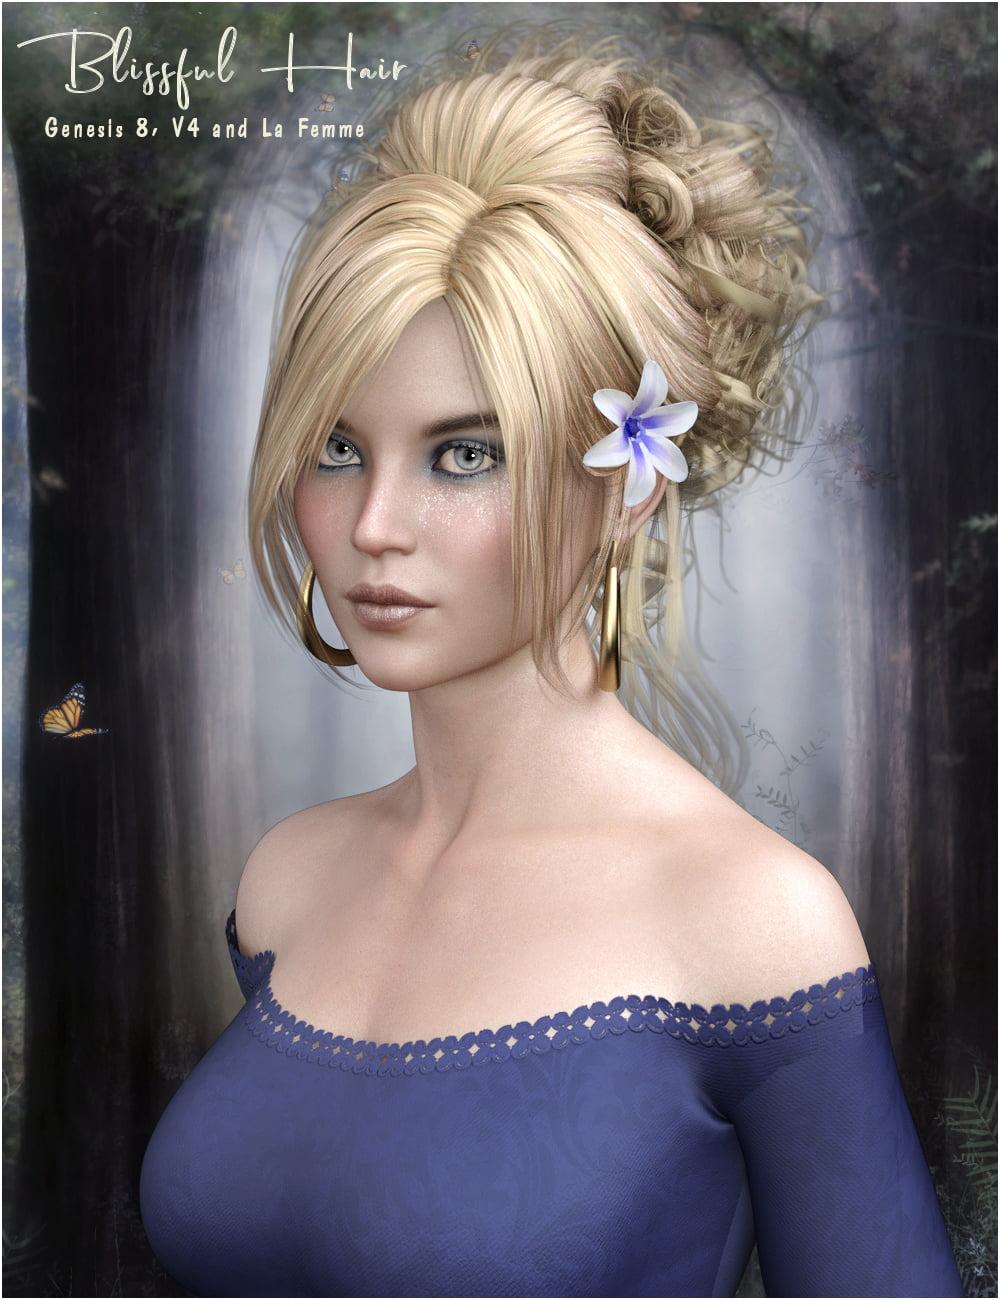 Blissful Hair G8/V4 and La Femme